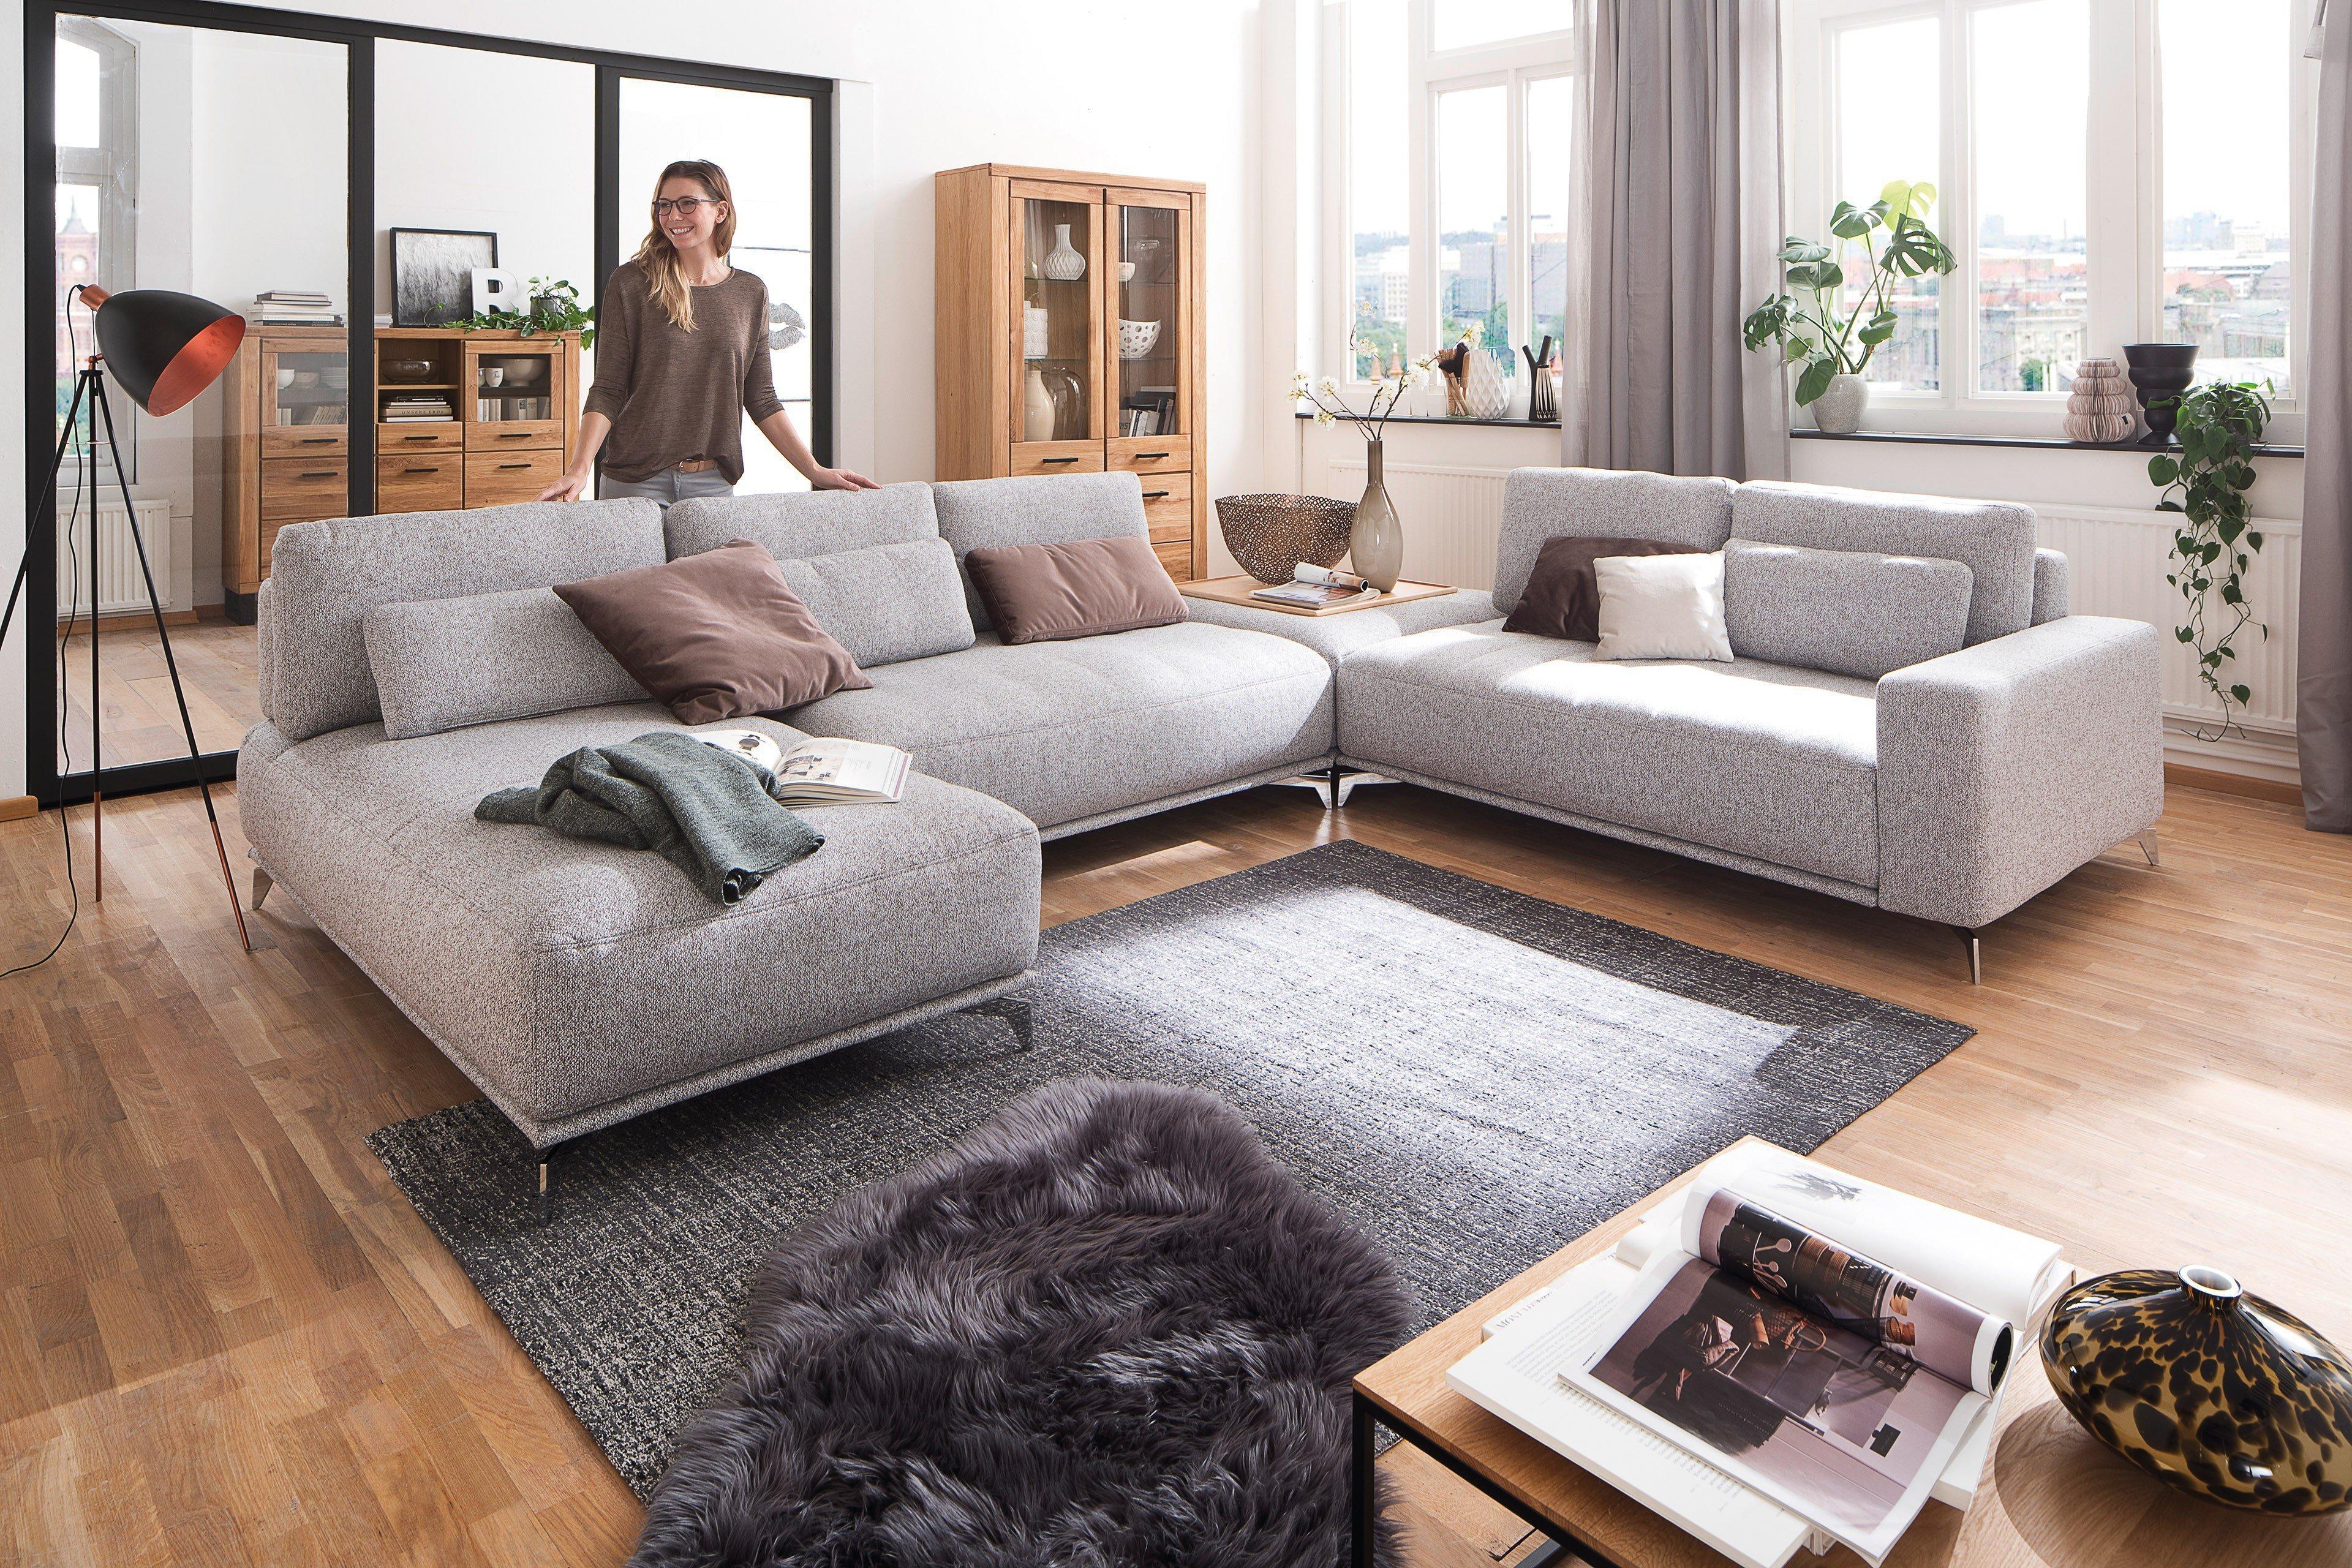 poco polsterm bel salerno polstergarnitur creme m bel letz ihr online shop. Black Bedroom Furniture Sets. Home Design Ideas